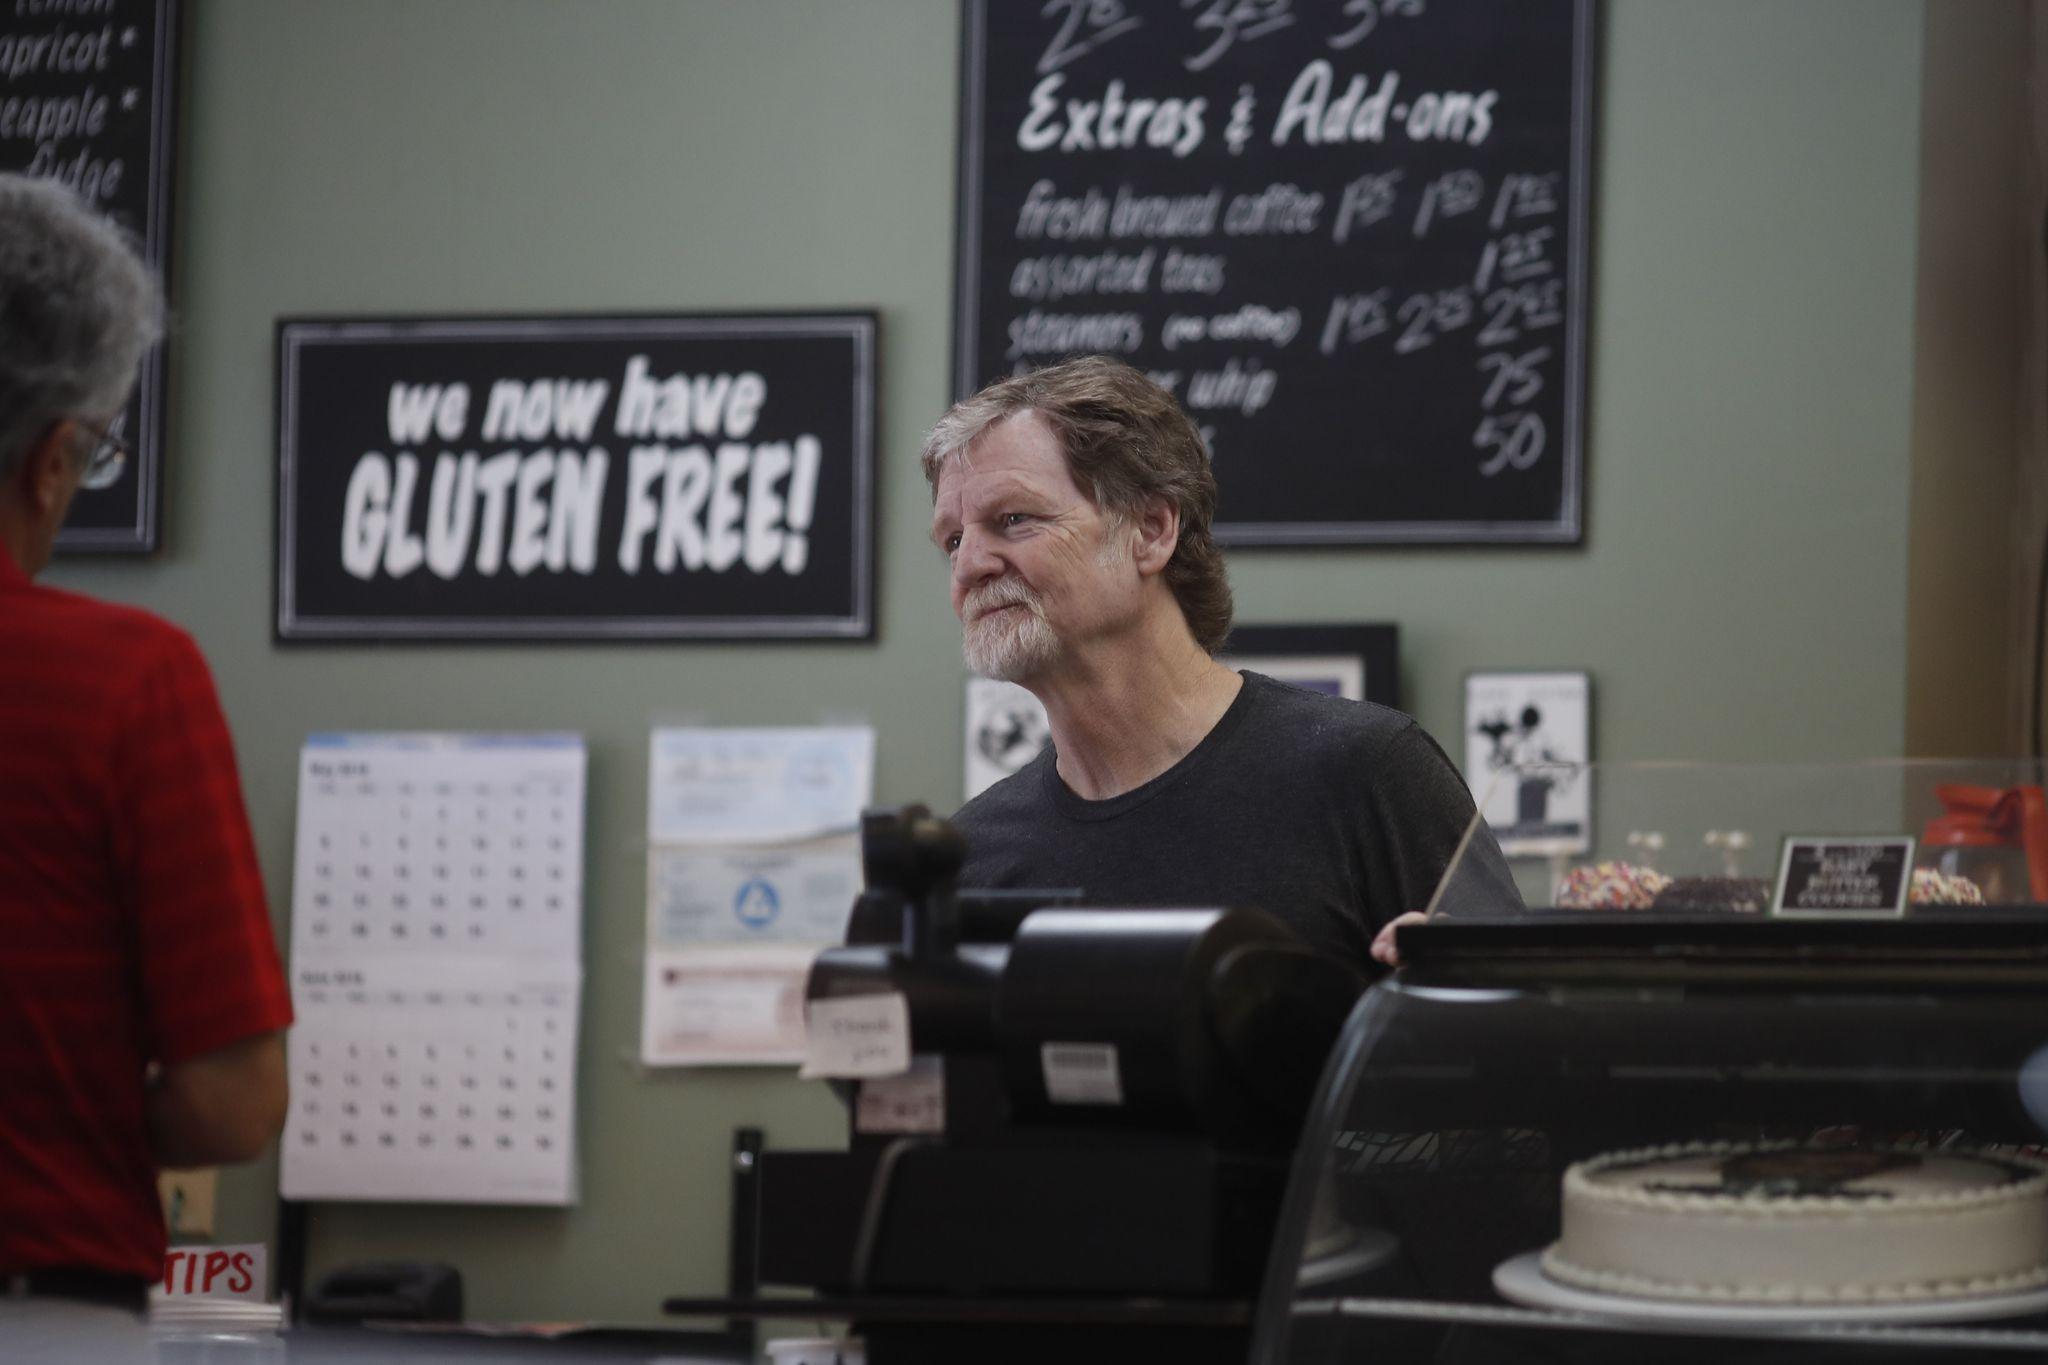 Colorado baker slammed with hostile reviews, protests after Supreme Court victory